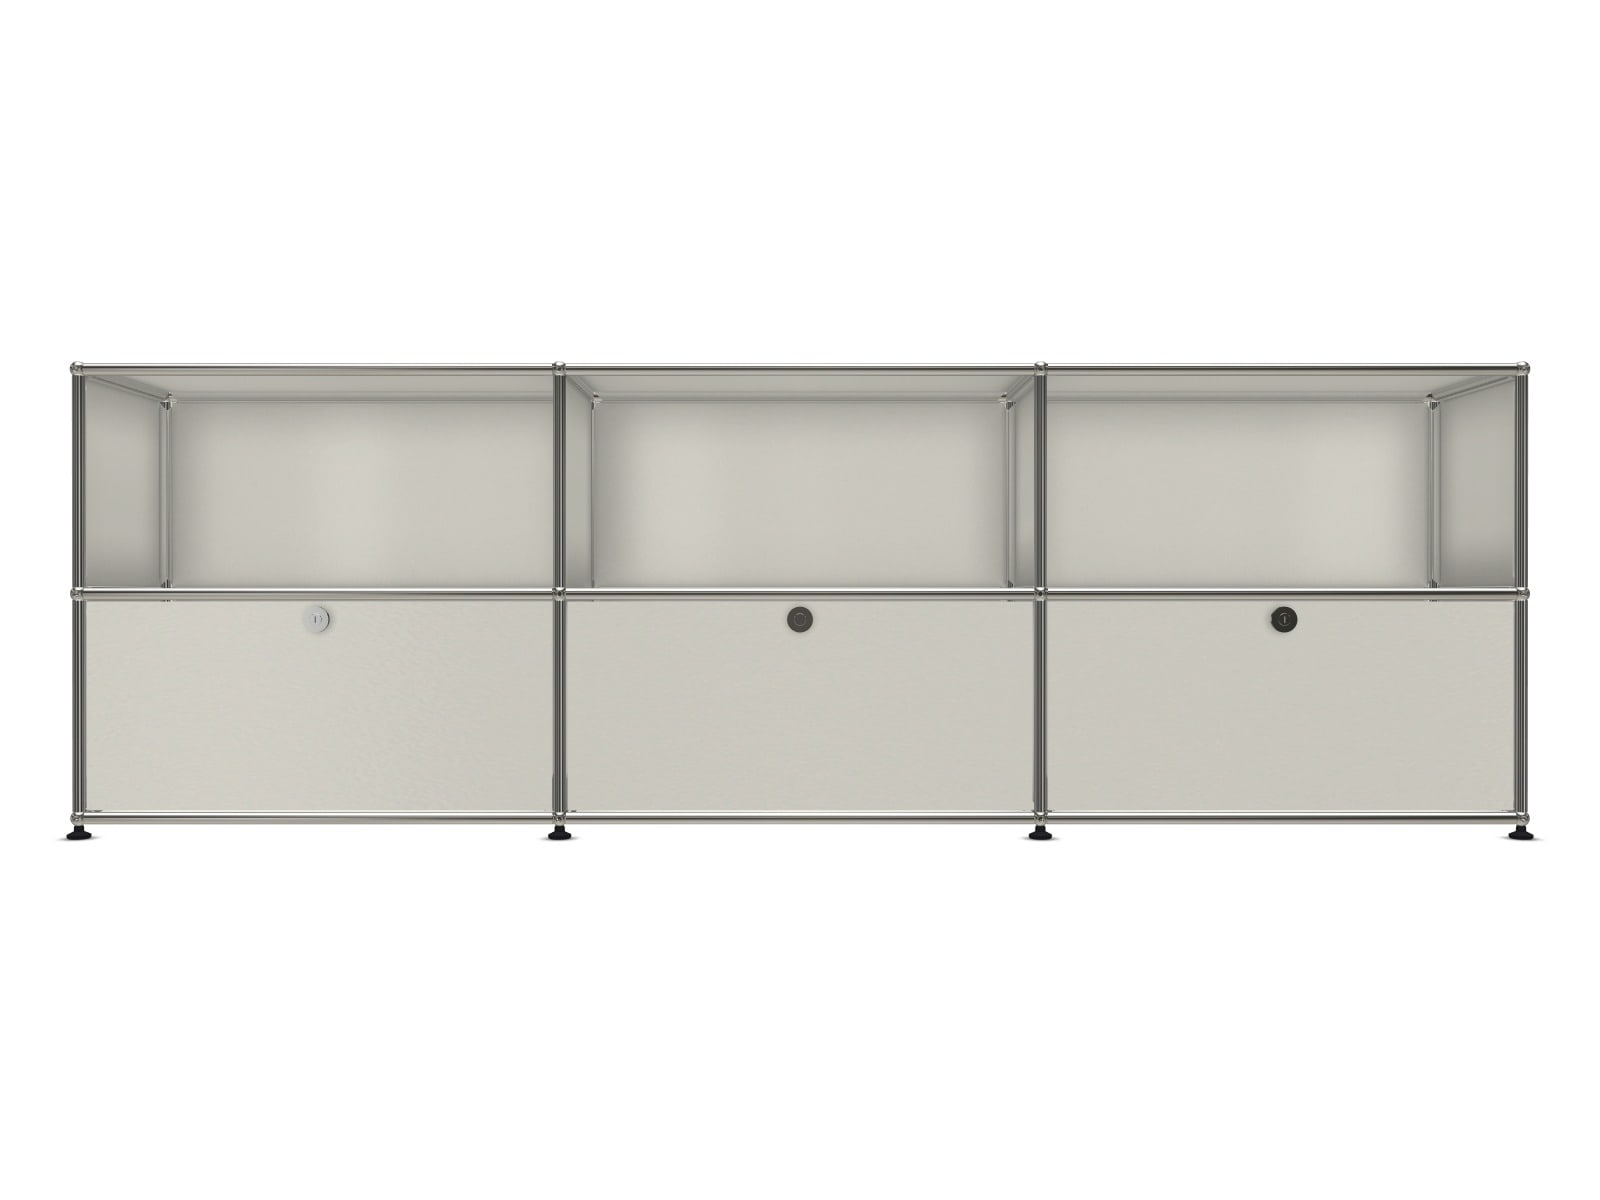 Usm Haller Sideboard 3x2 With Three Extension Doors